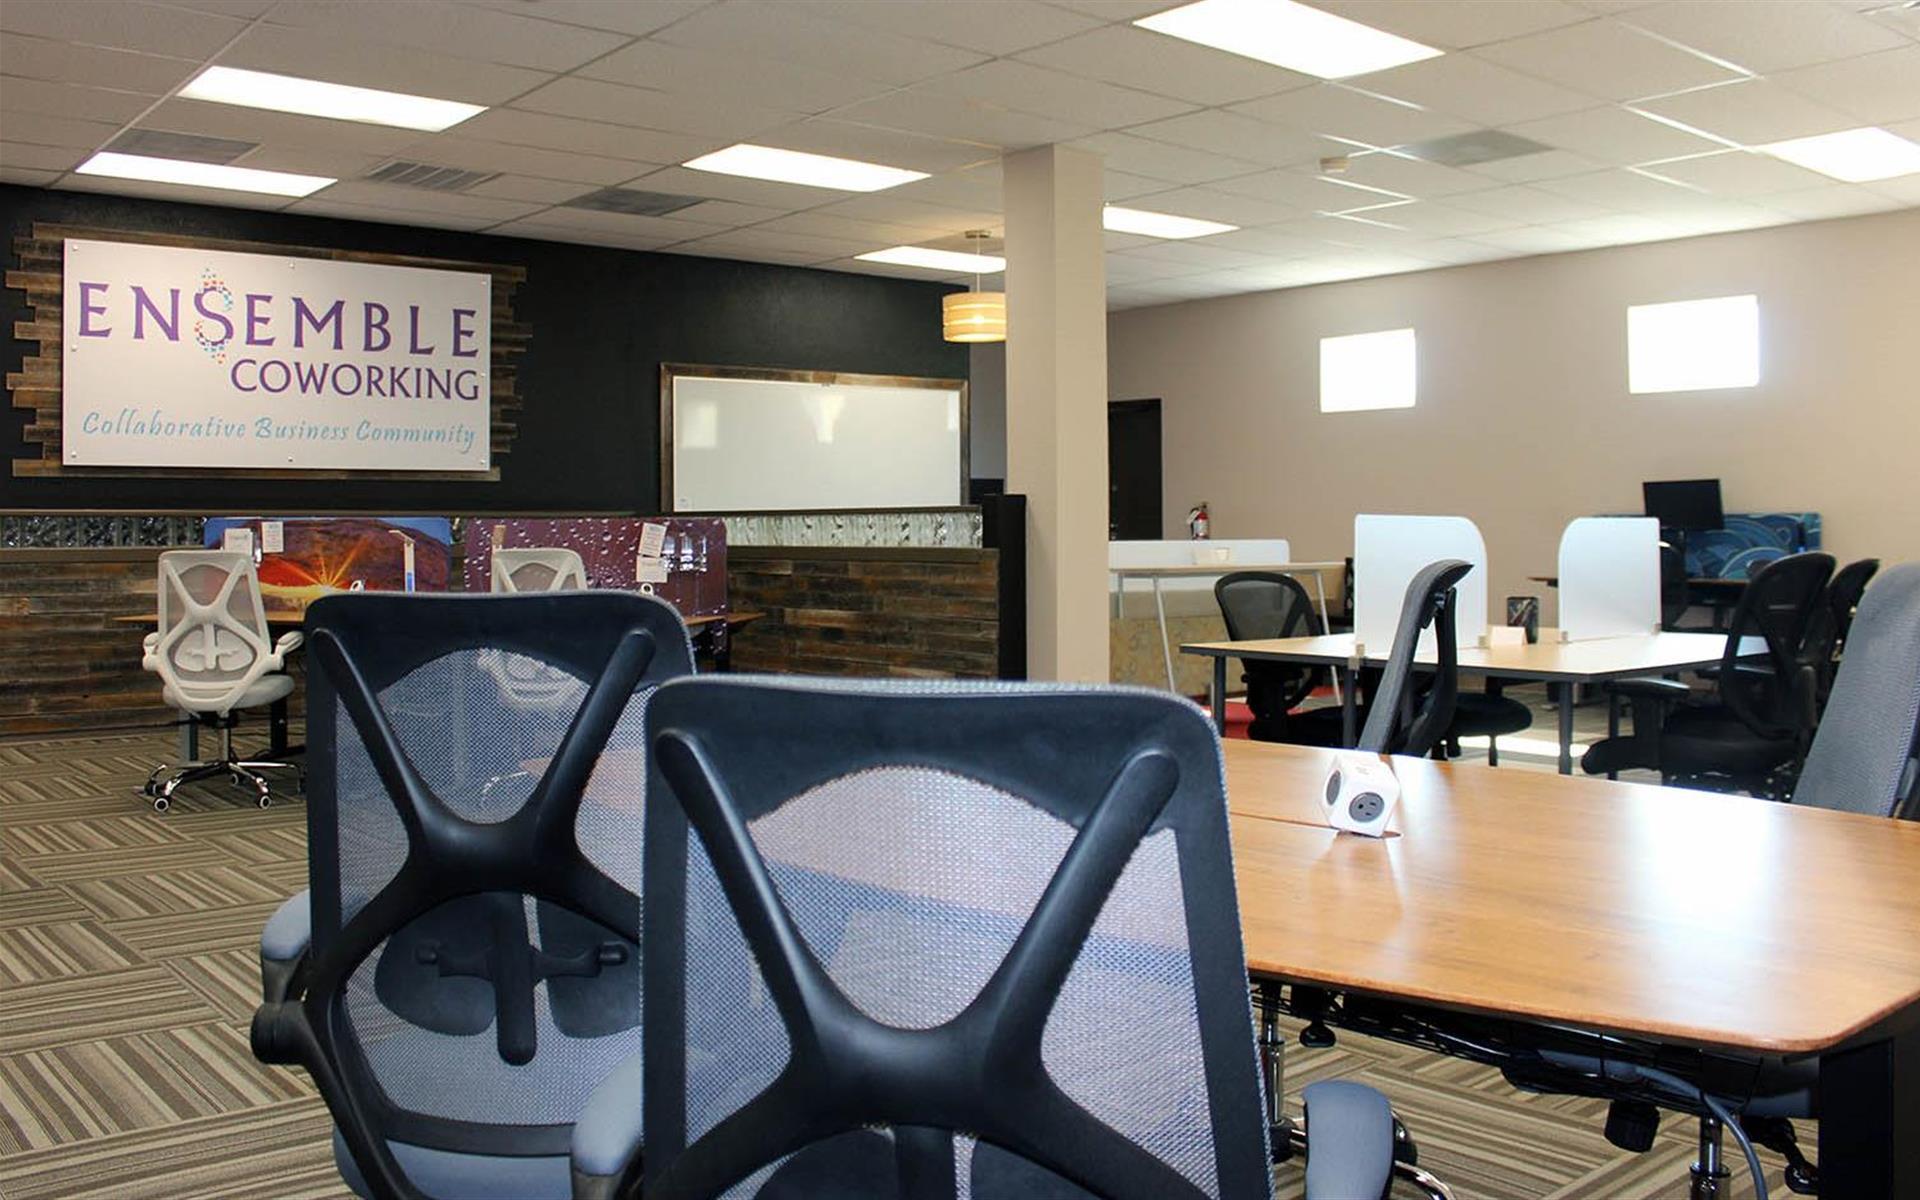 Ensemble Coworking - Bridge Coworking Membership